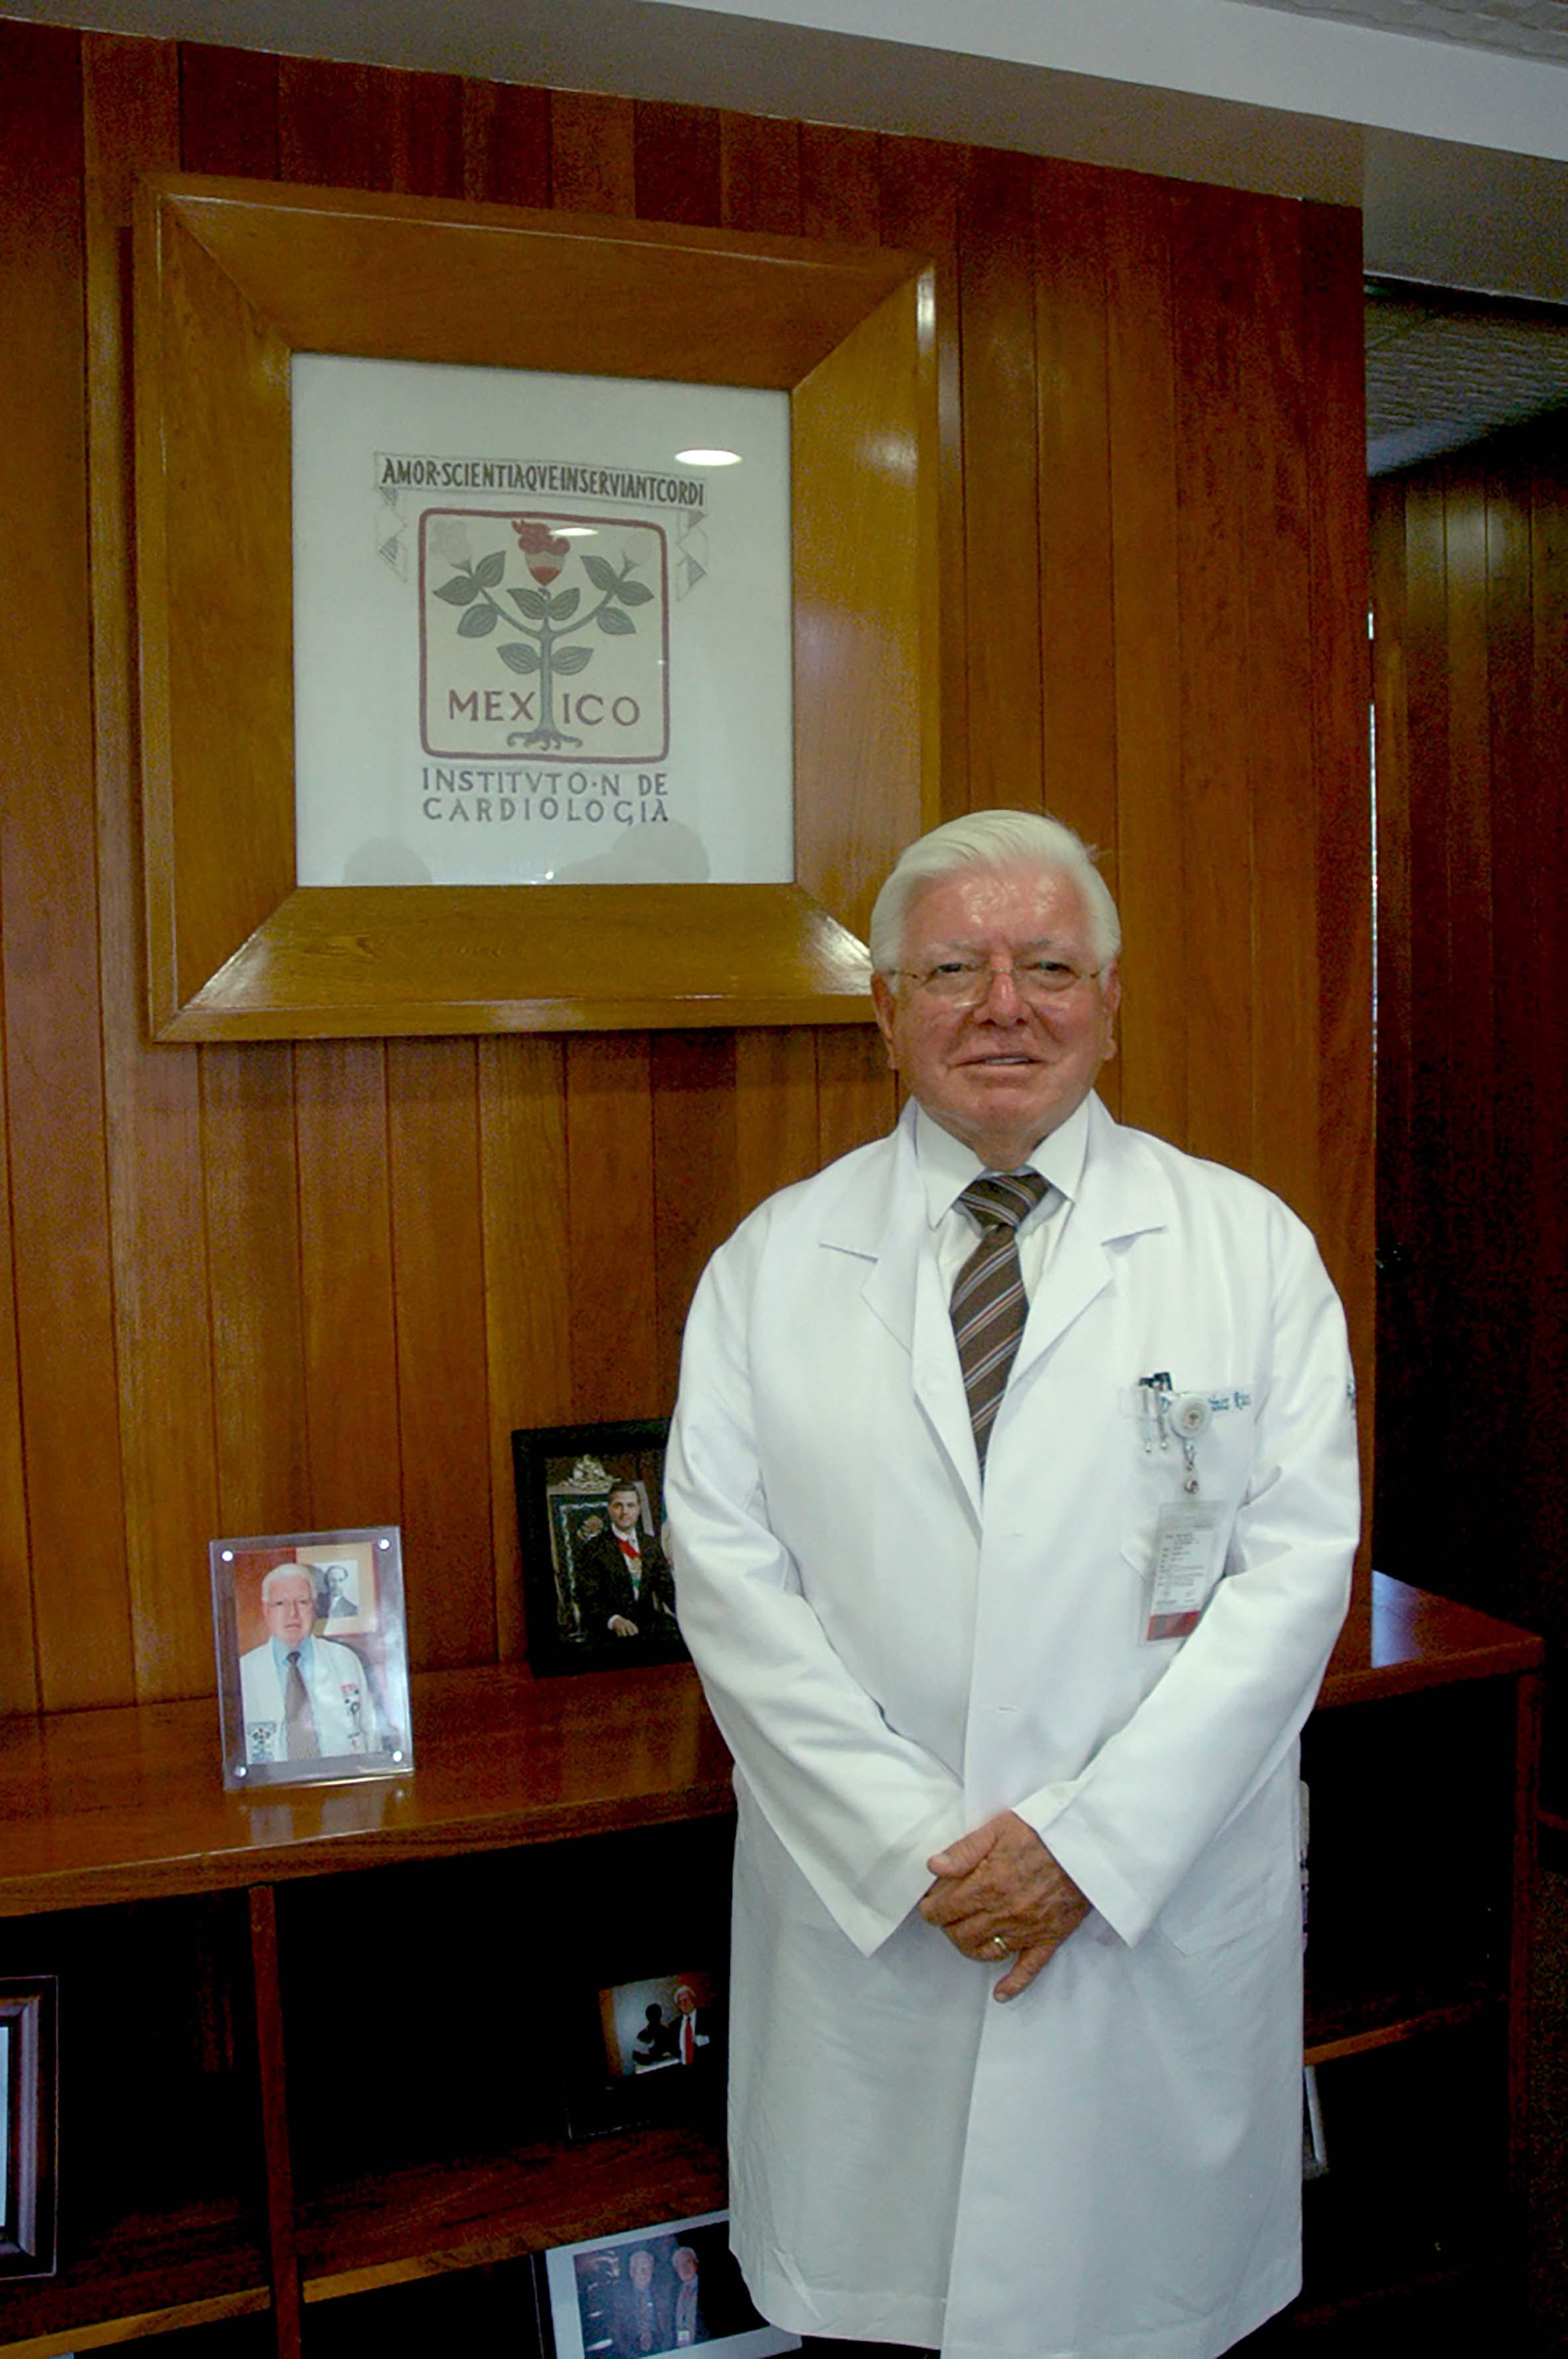 070715 Dr. Marco Antonio Mart nez R os Dir. Gral. 01.jpg